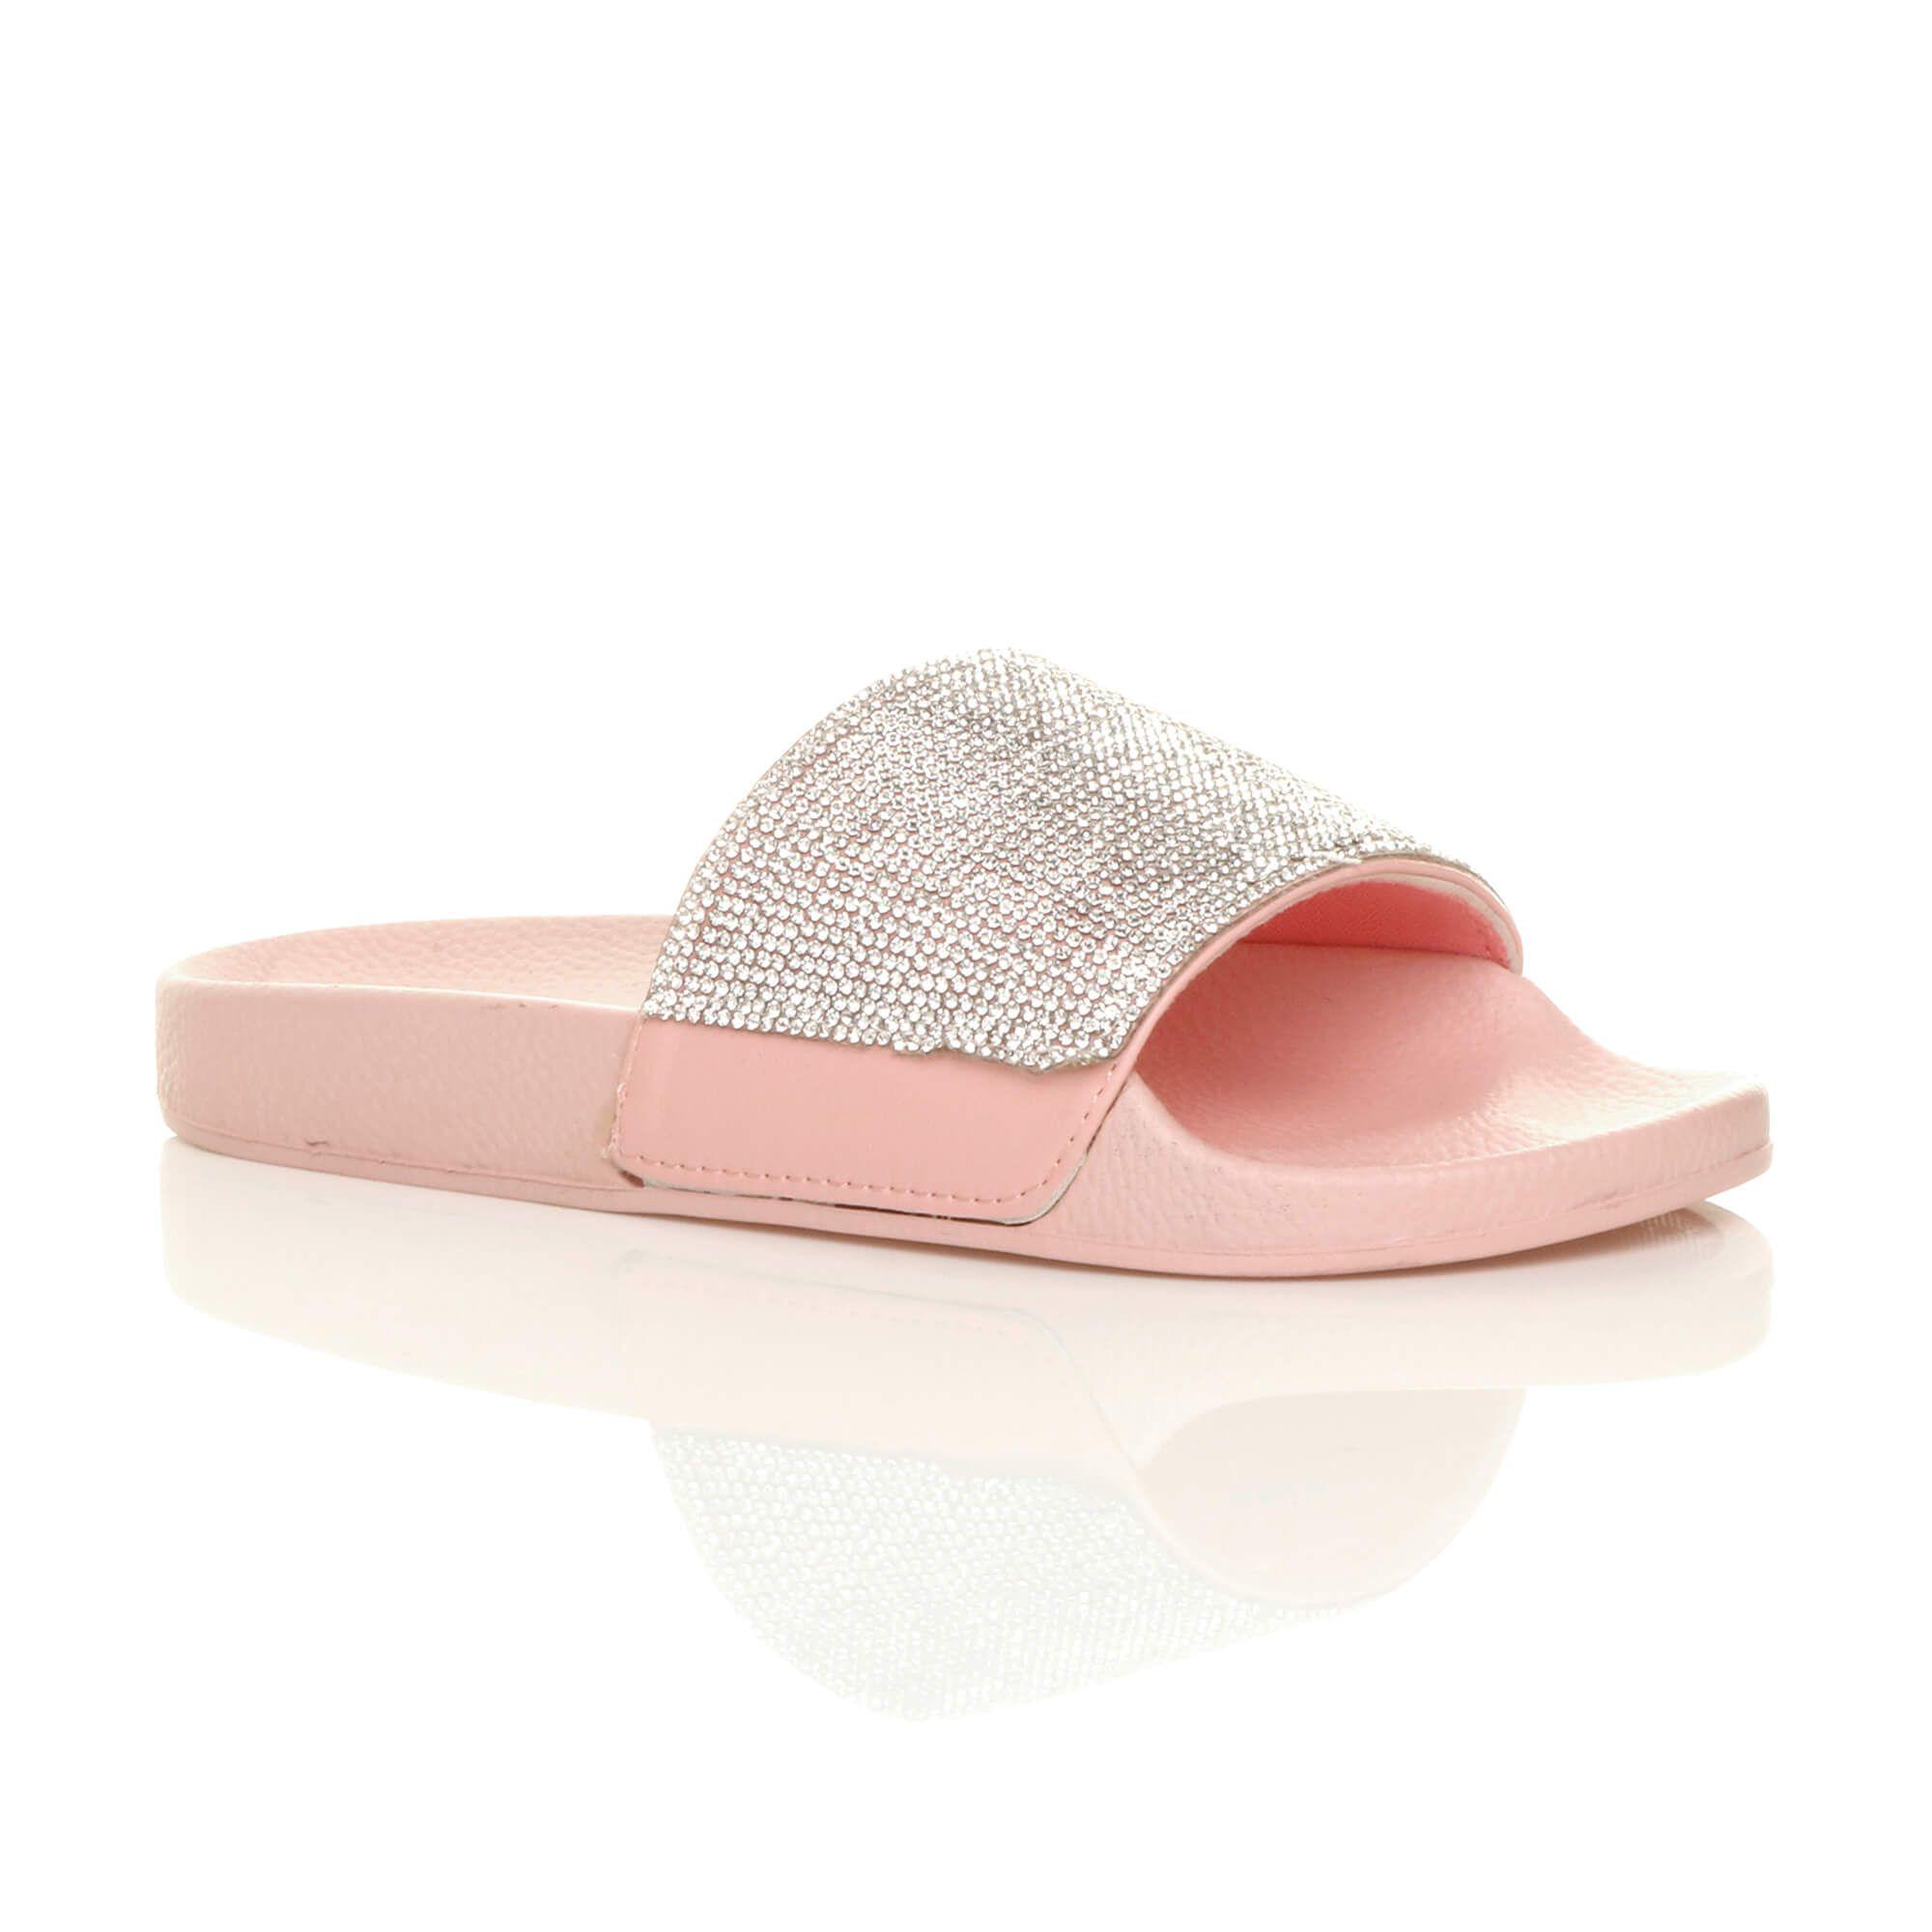 Flat Diamante Flip Flops Sliders Sandals – H3586